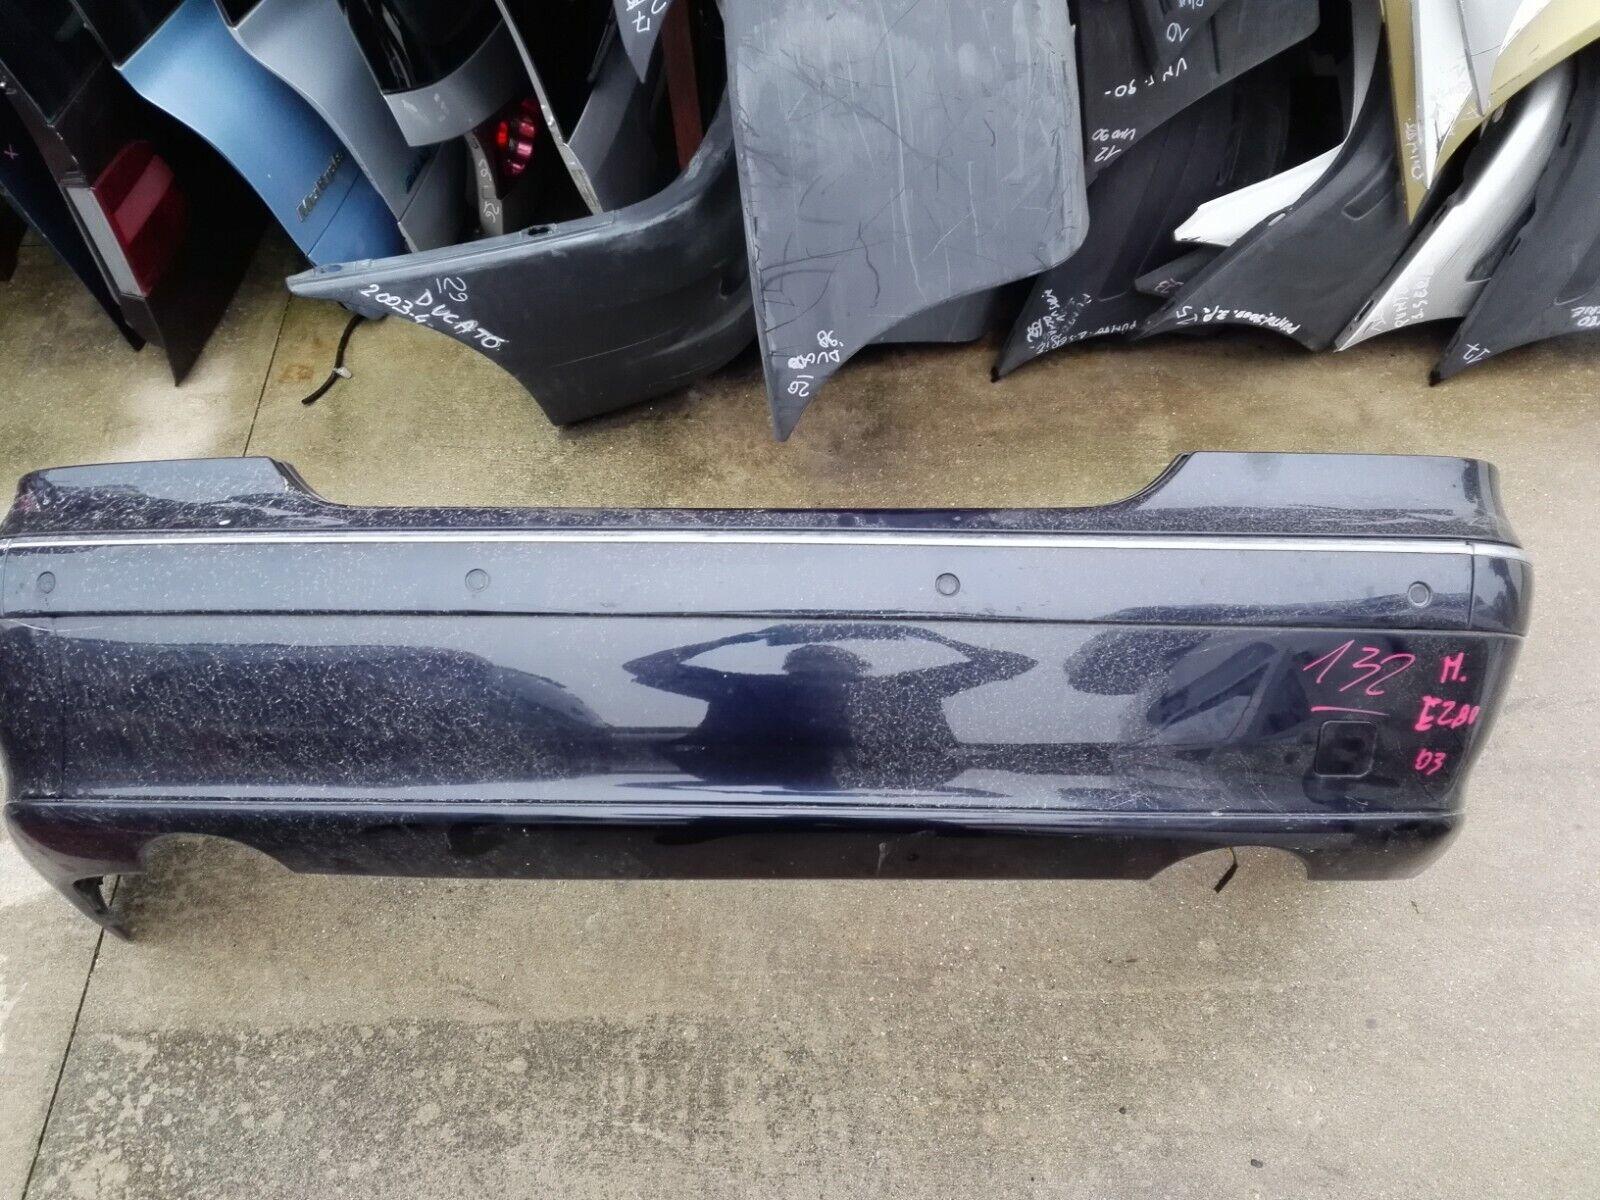 ML 320 163 W163 P2545 EQUAL QUALITY Paraurti anteriore MERCEDES-BENZ CLASSE M